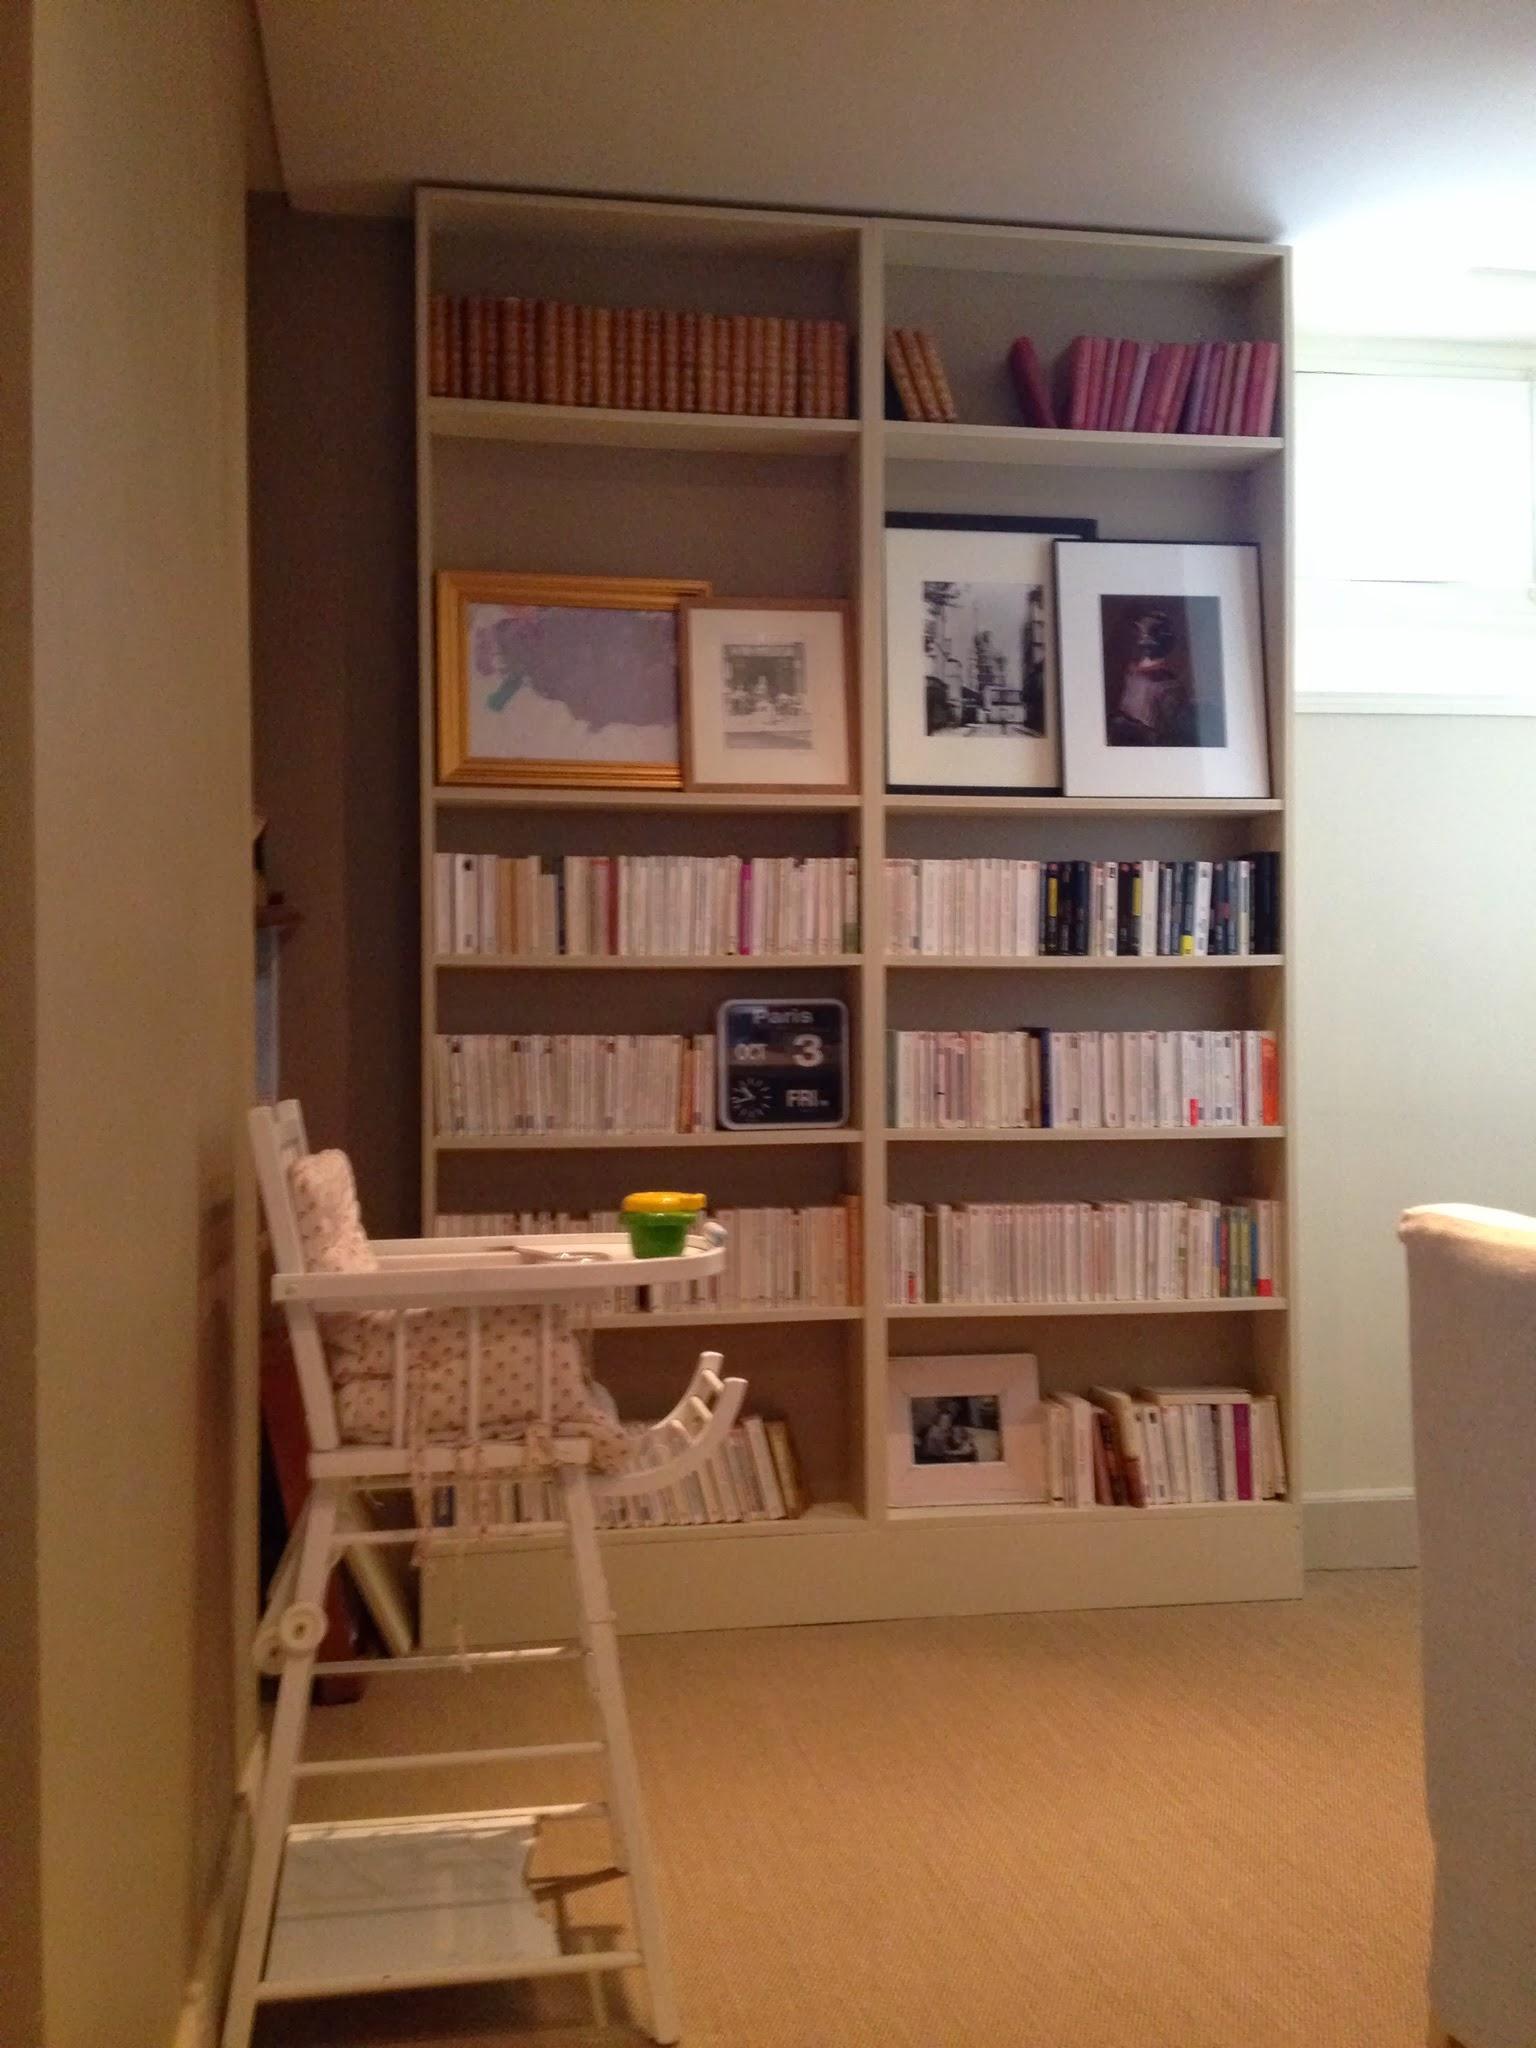 pose cuisine ikea architecte. Black Bedroom Furniture Sets. Home Design Ideas